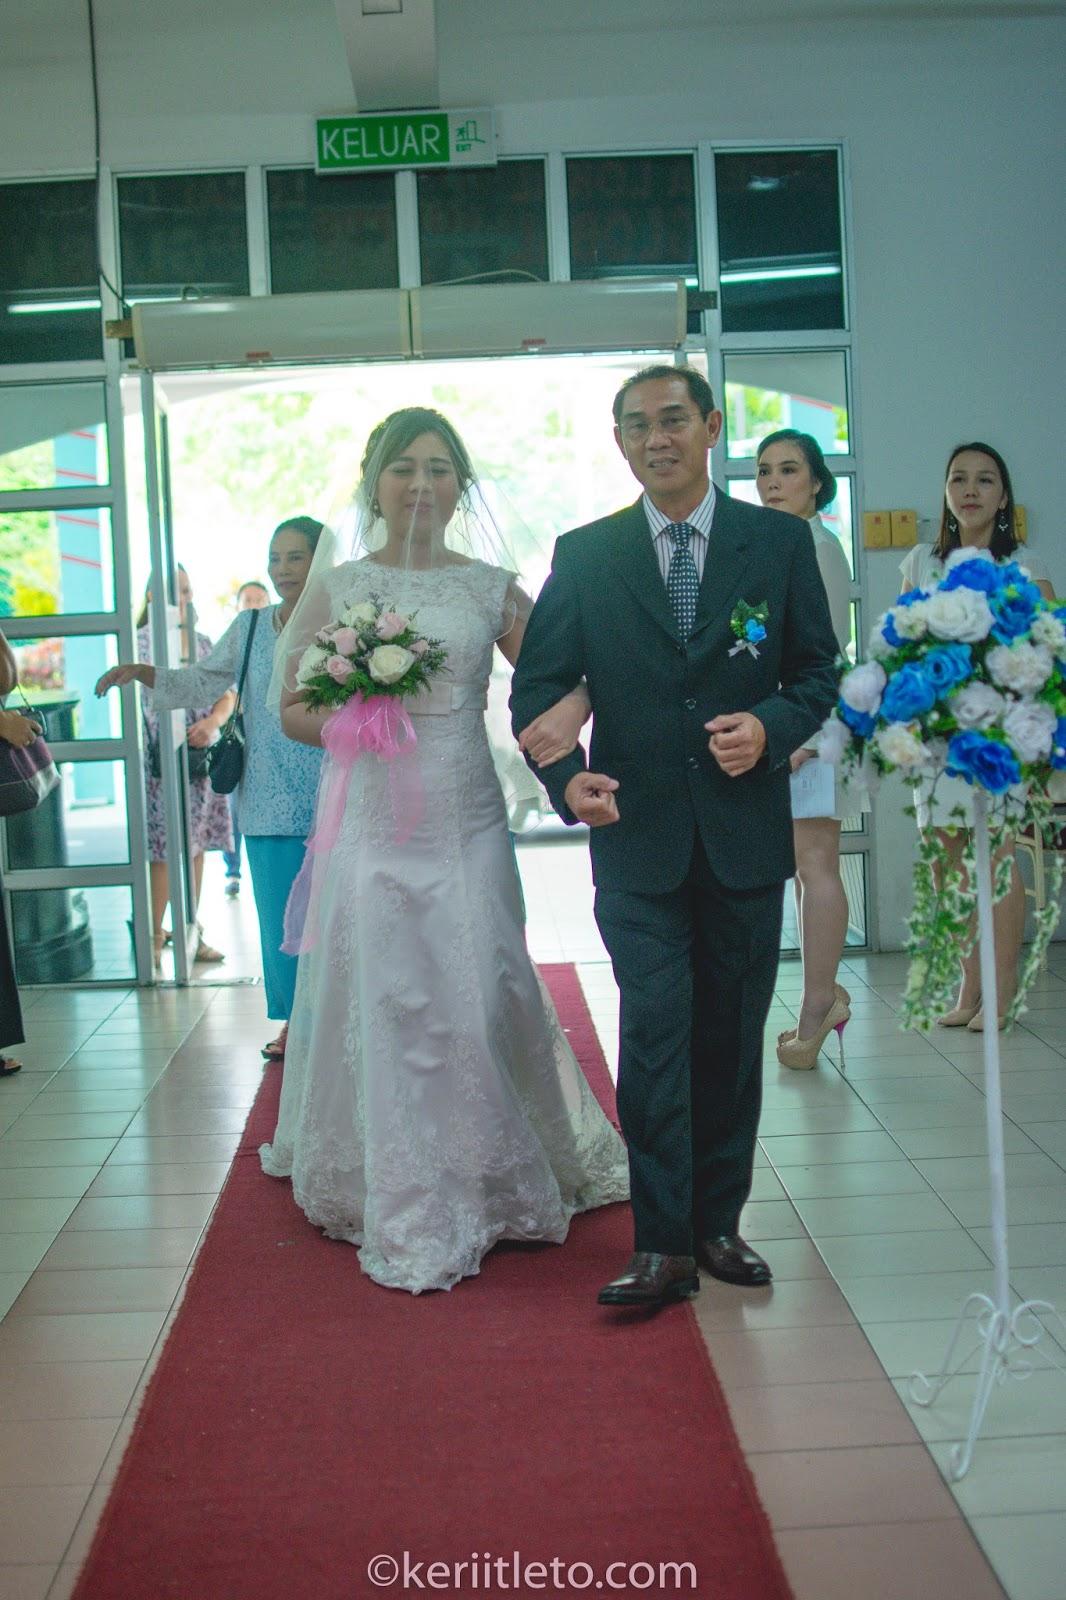 KERIITLETO: Nelsion & Alice Wedding Day - 2 Dec 2017